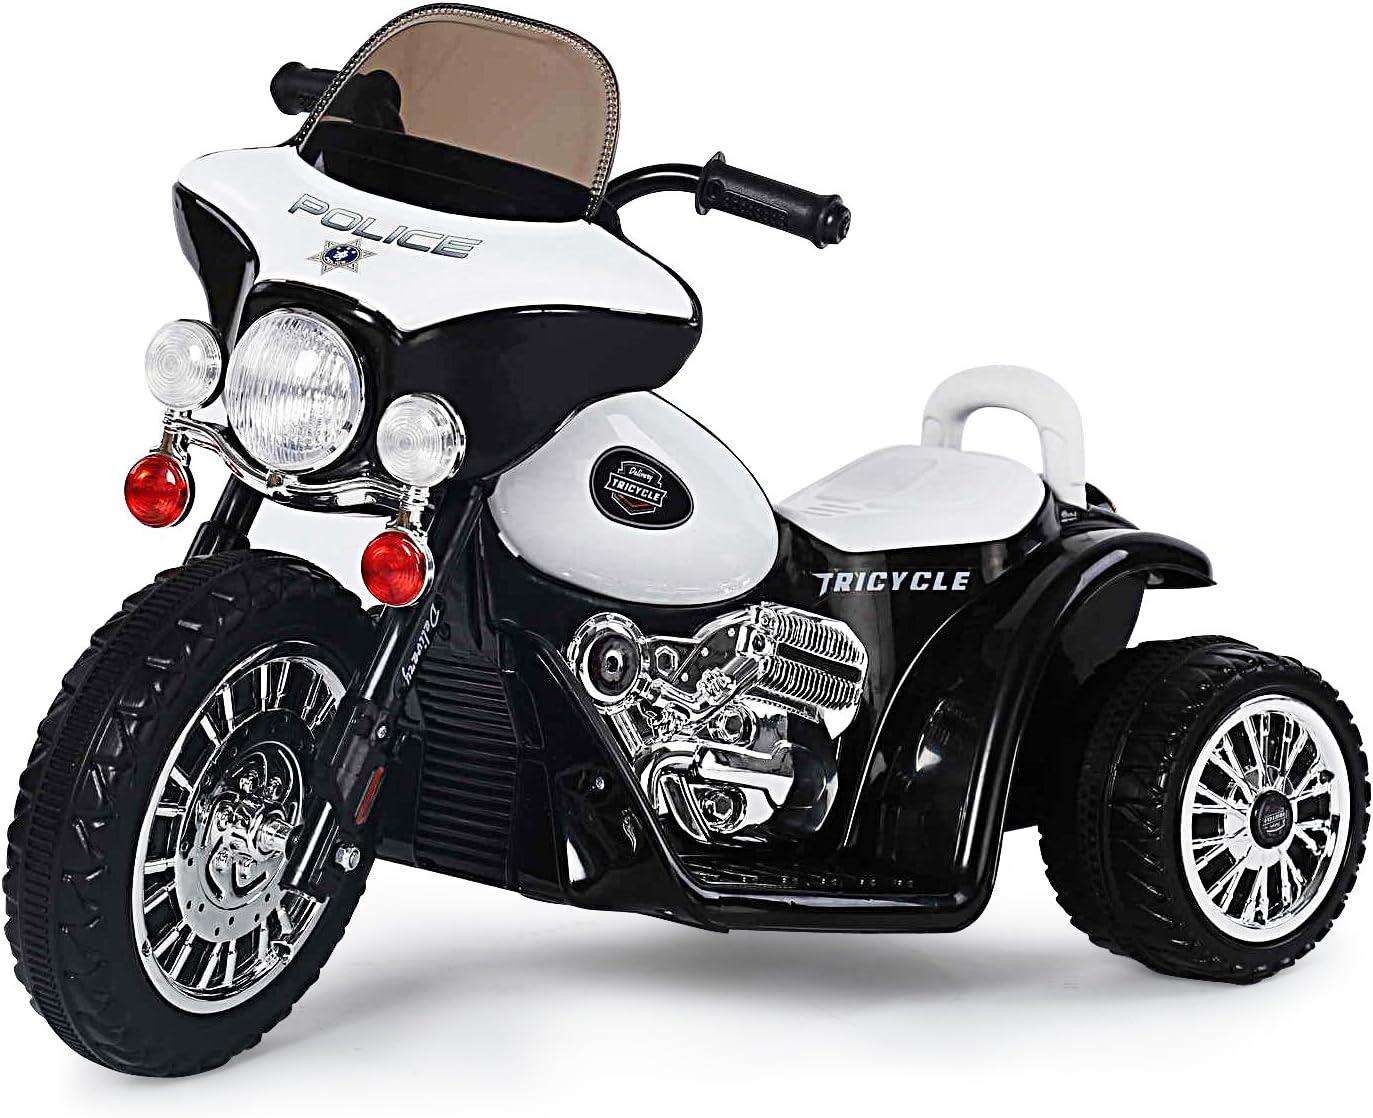 Harley infantil Moto rrad motocicleta eléctrica infantil Vehículo Triciclo infantil Moto de Policía En Blanco/Negro